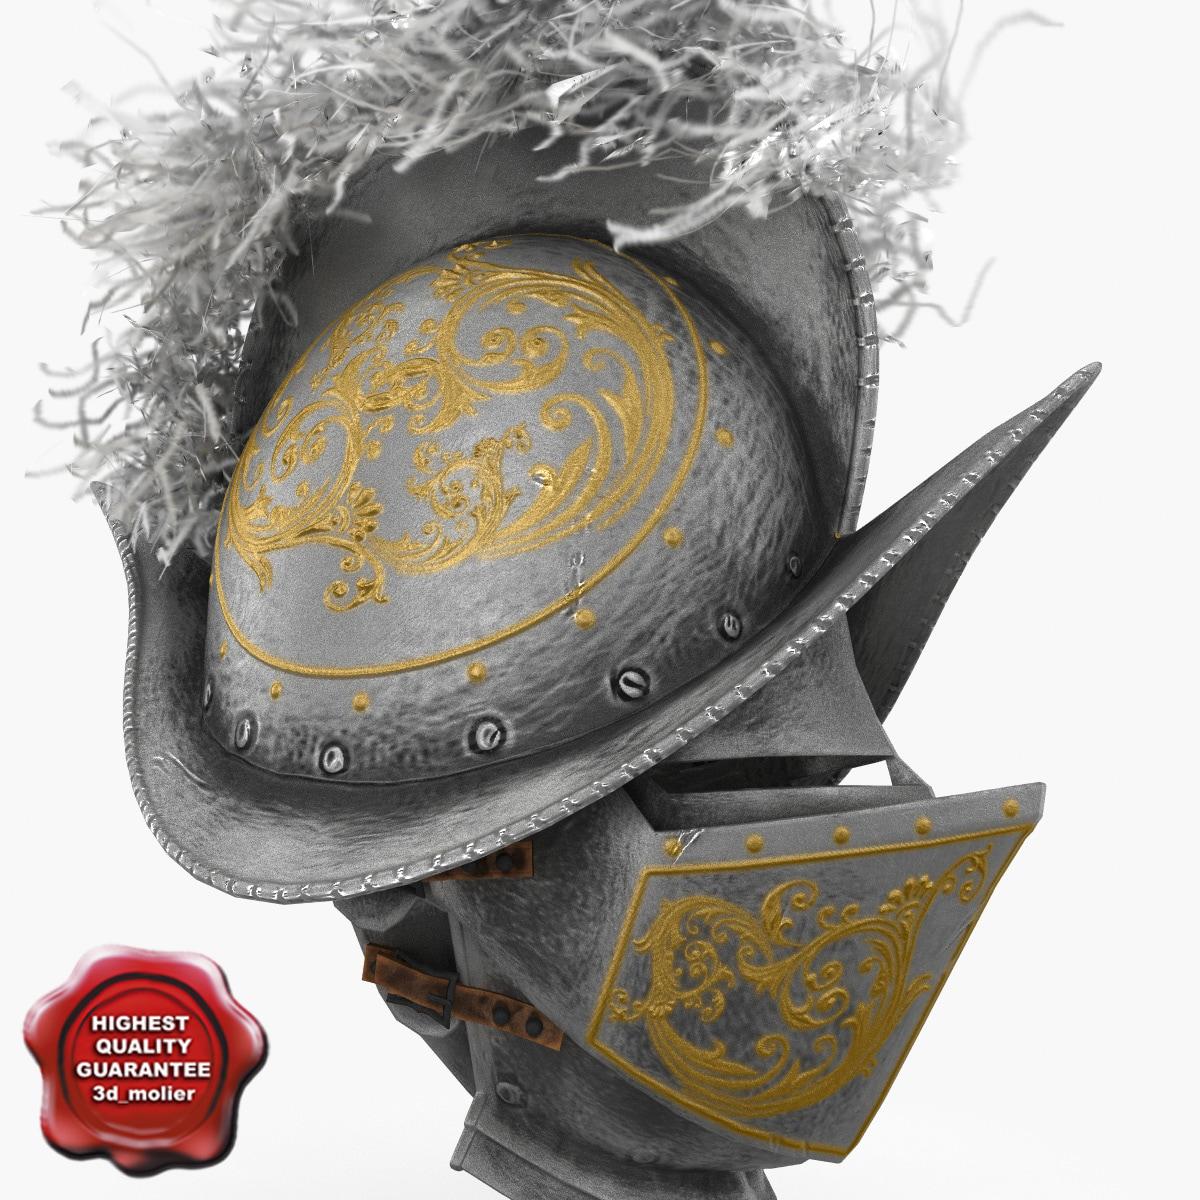 Swiss_Guardsmen_Helmet_00.jpg